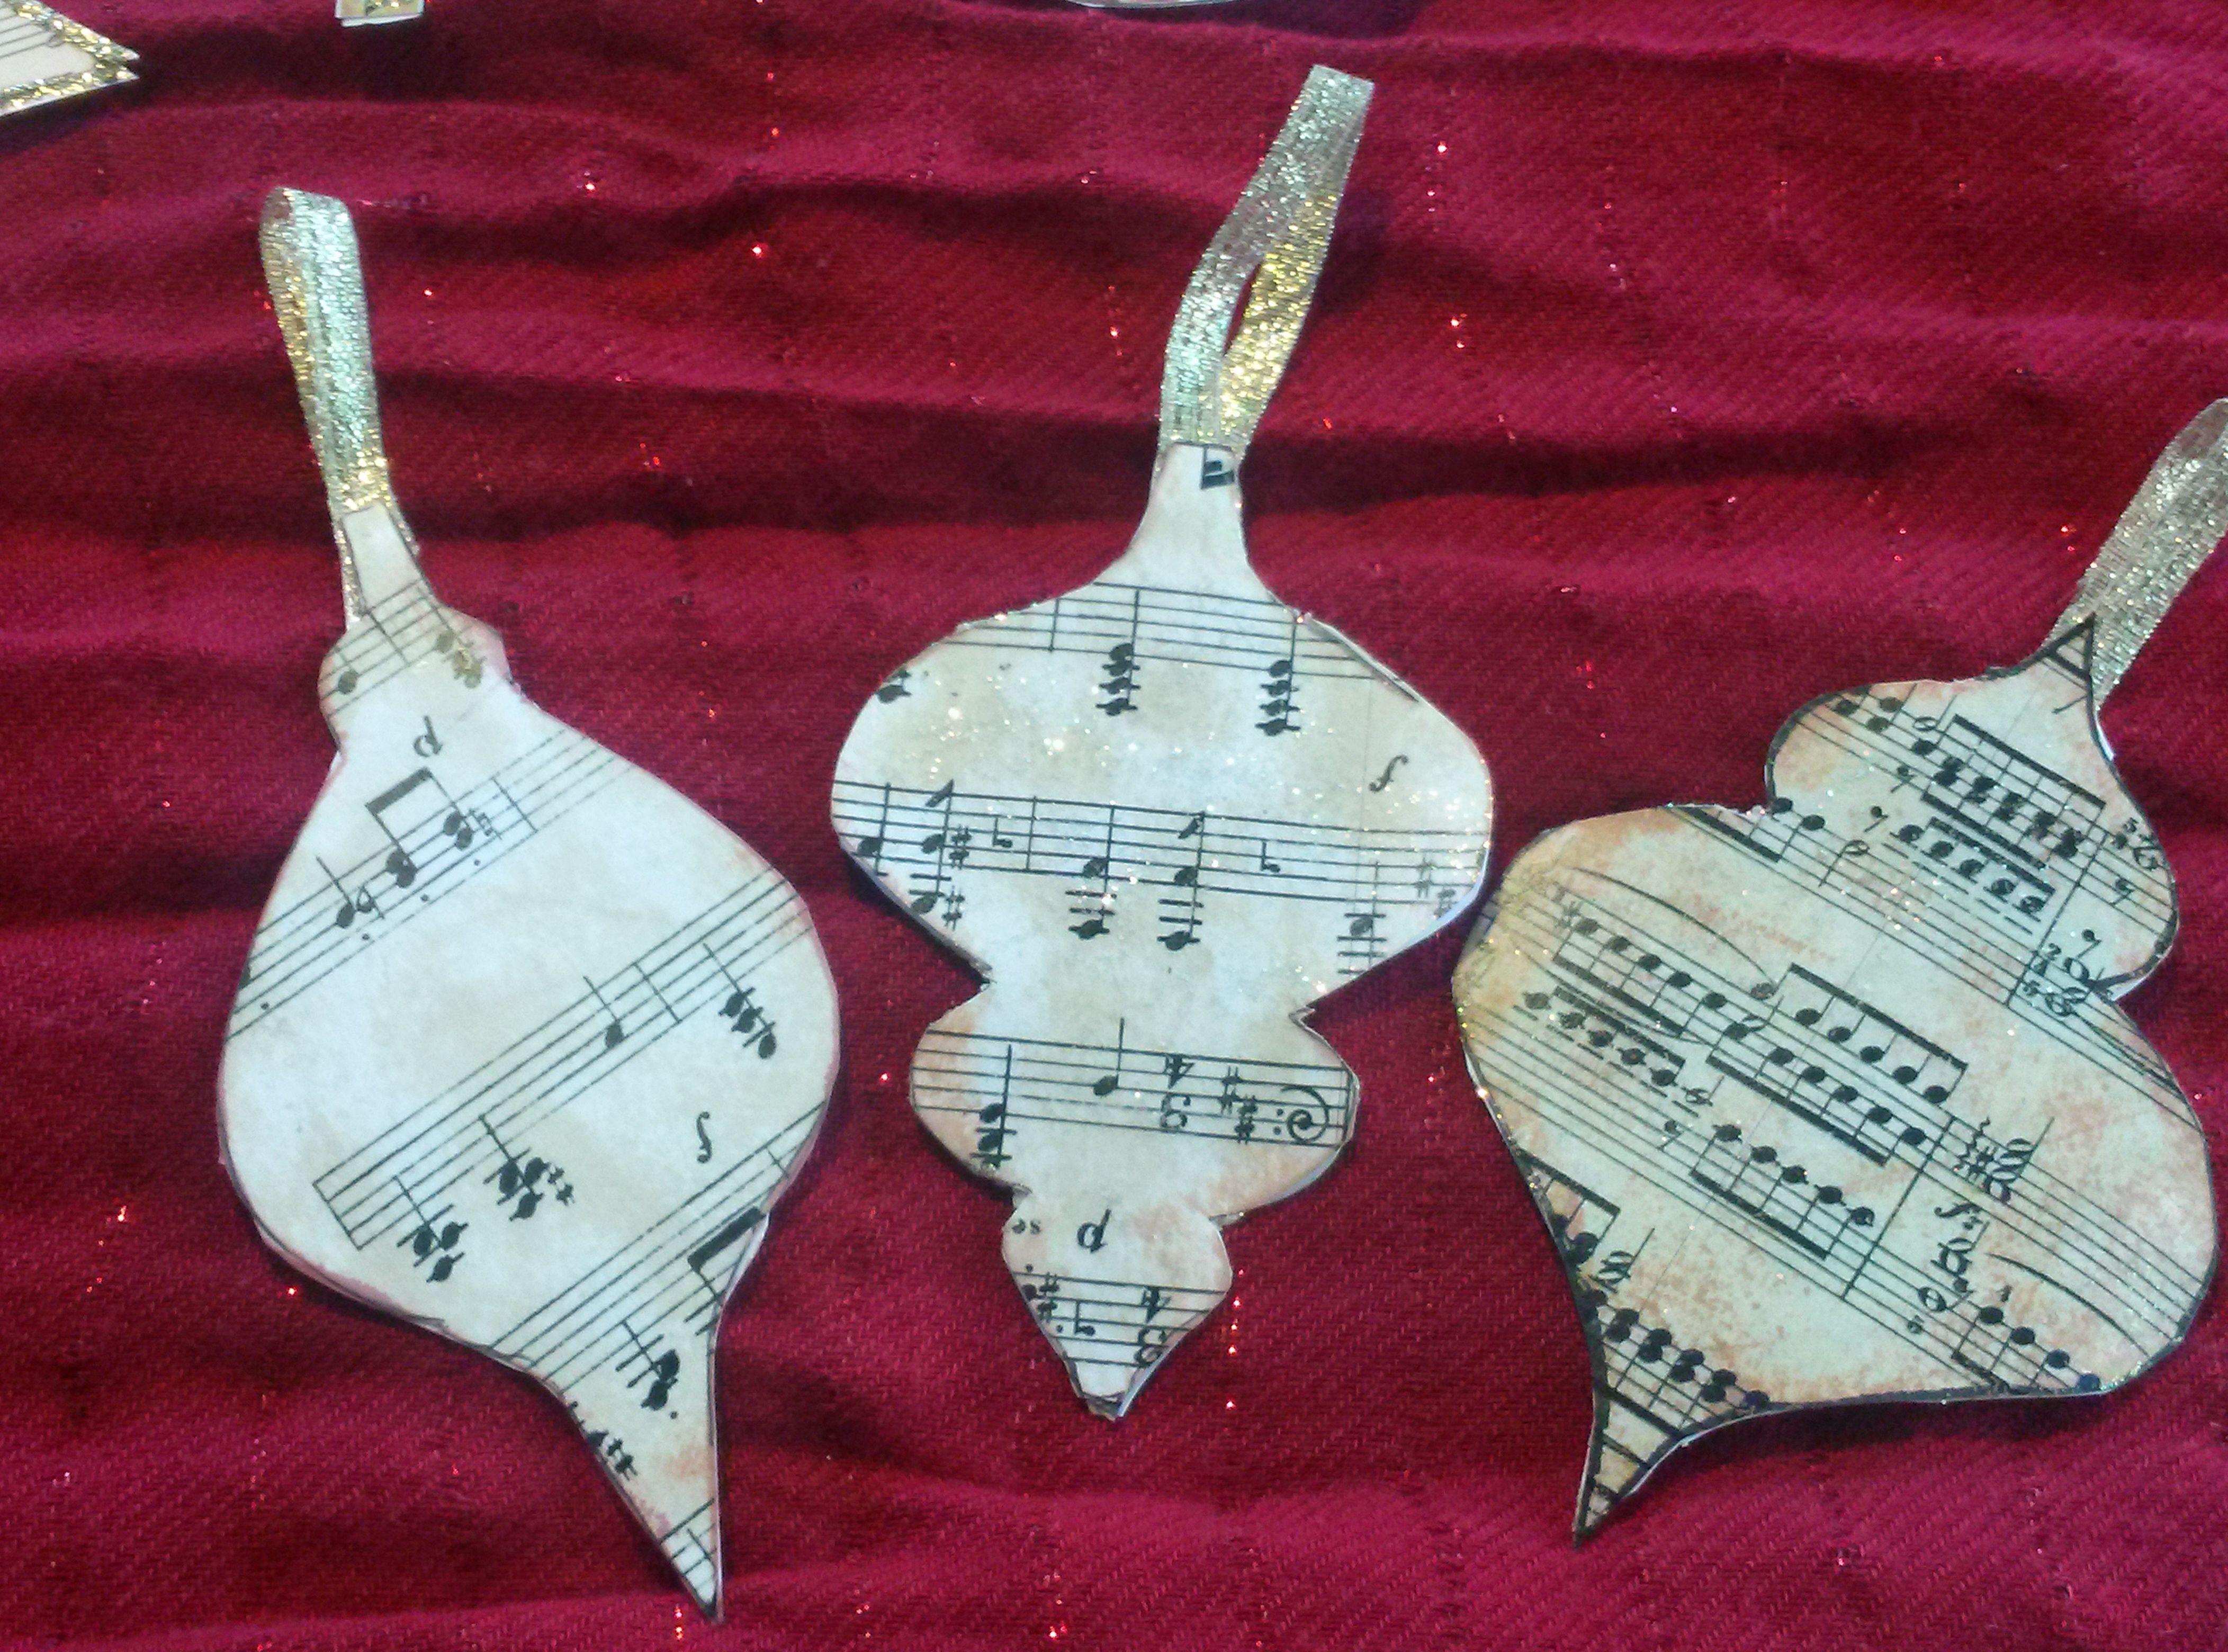 Music christmas ornaments - Diy Ornaments For A Music Themed Christmas Tree